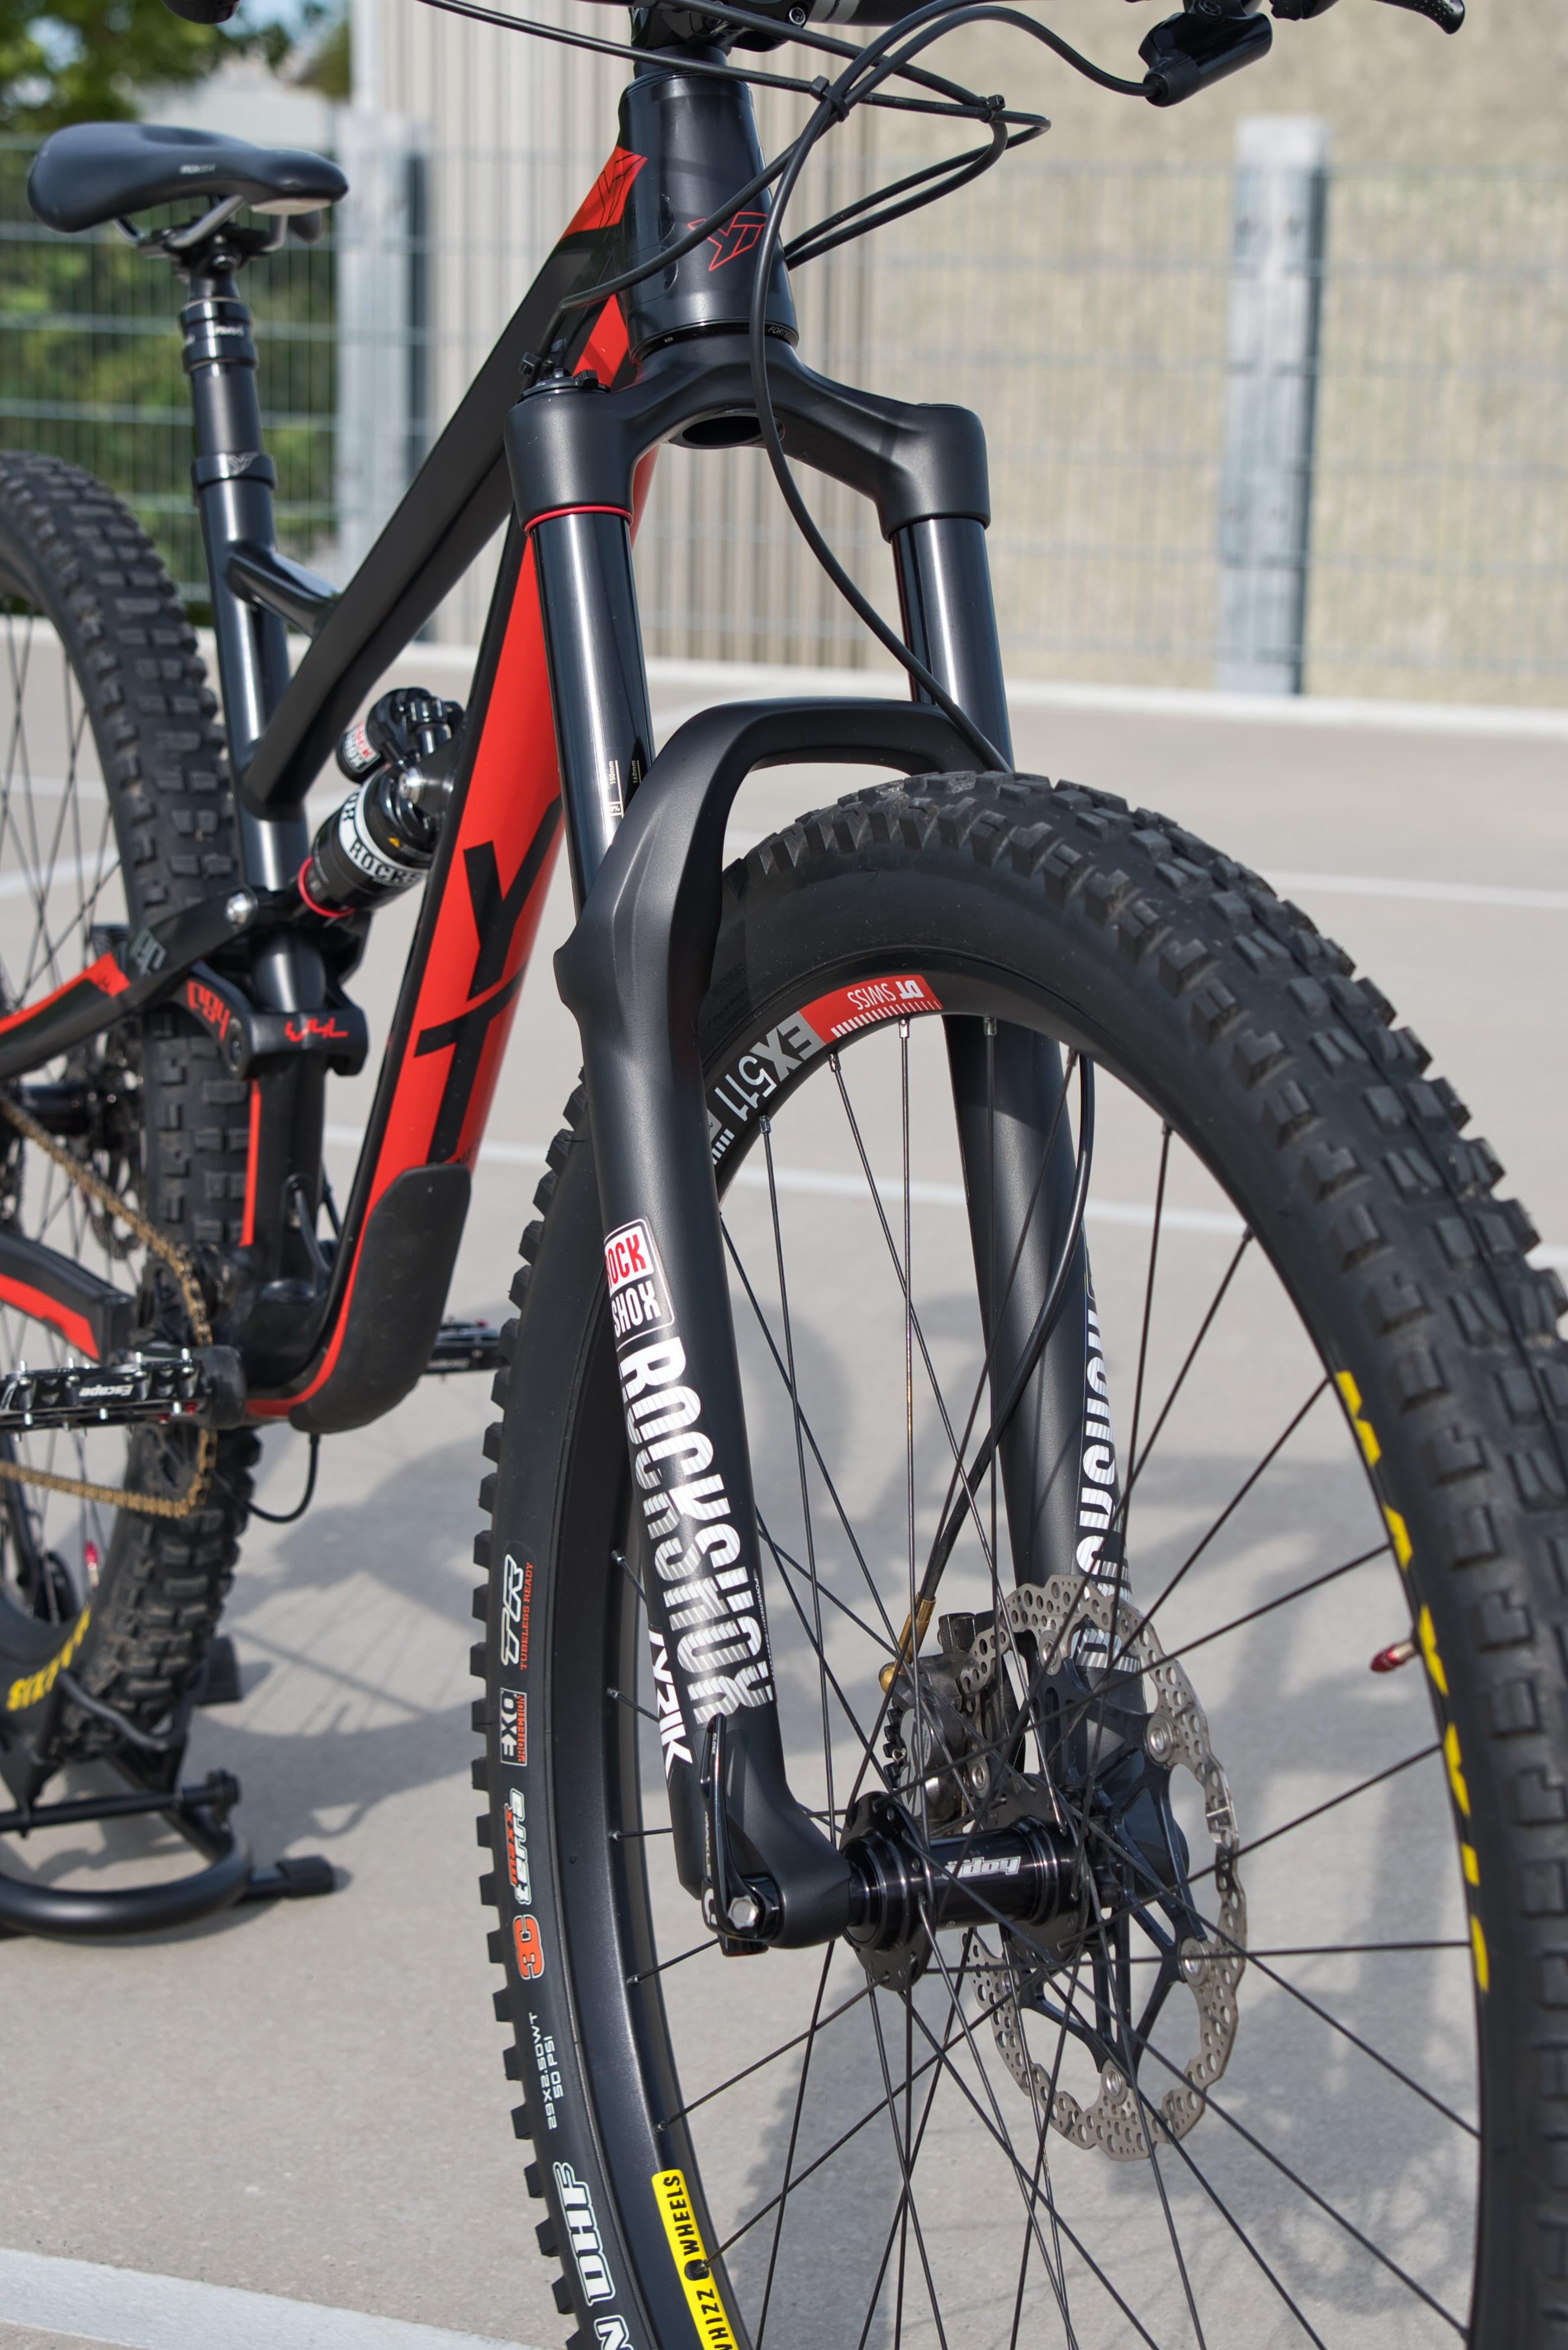 Red Mountainbike Detailed Shot. Front Rockshox Lyrik Fork with Debonaire Upgrade installed